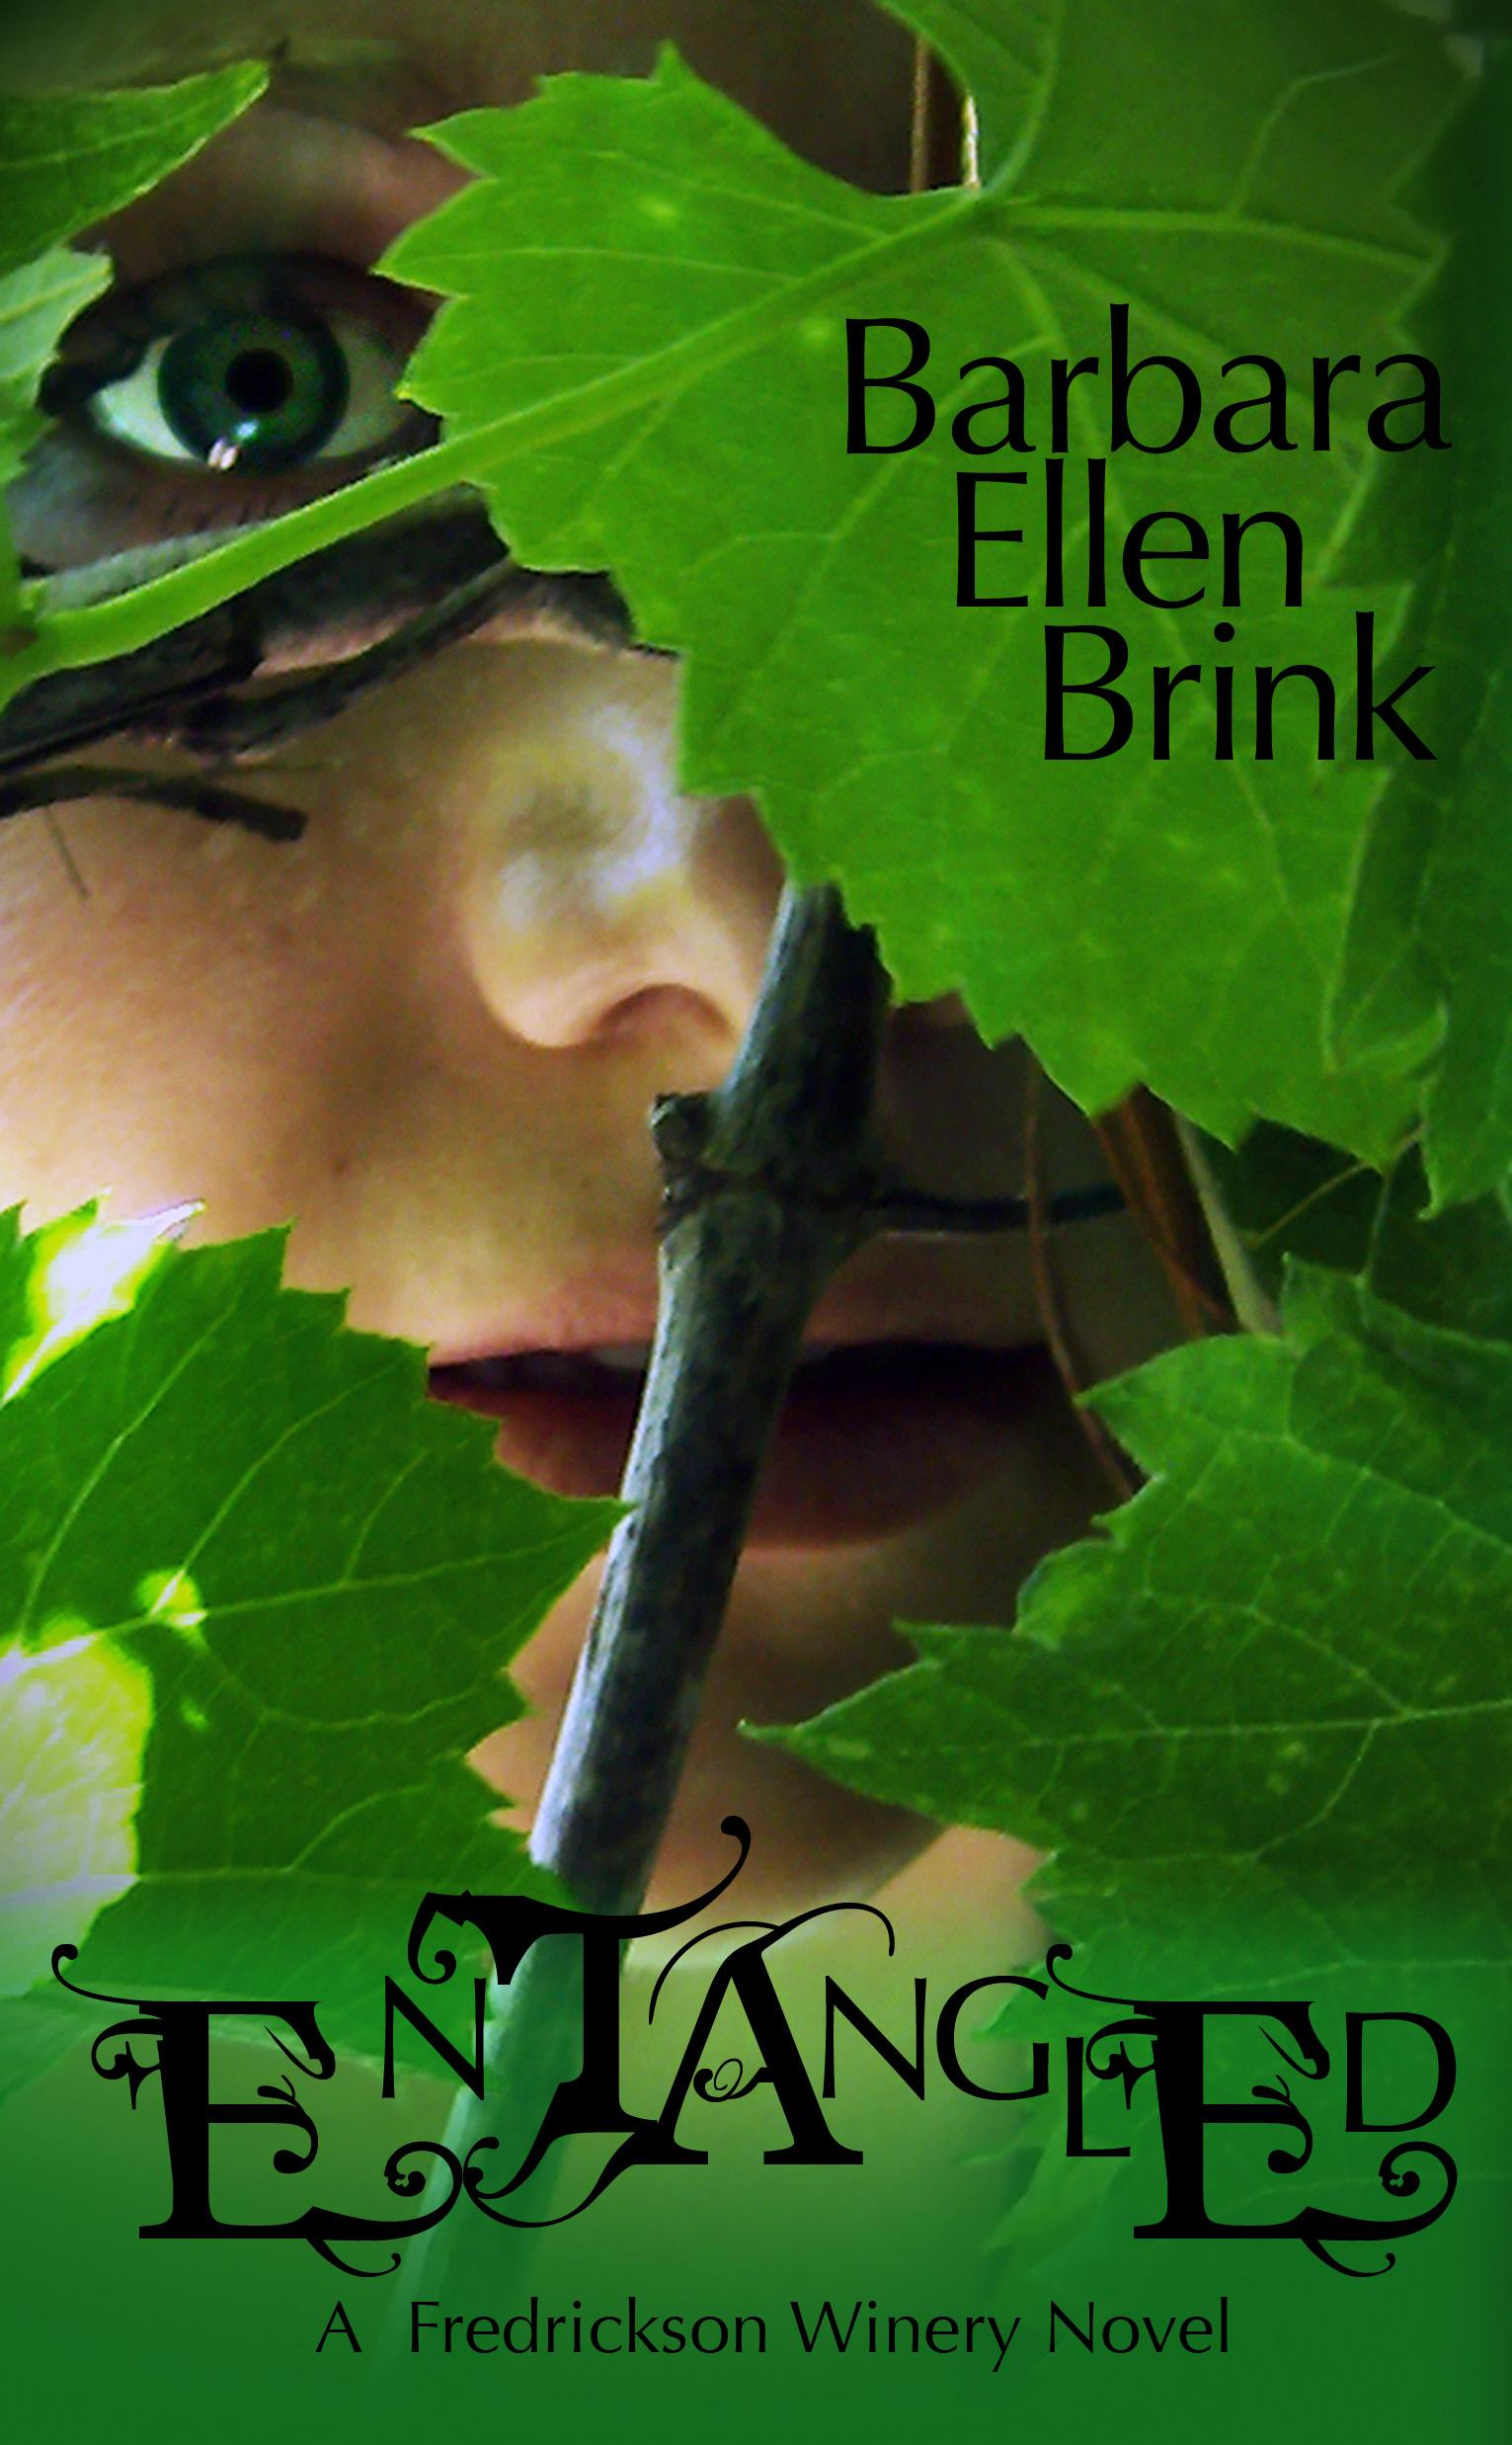 Entangled (Book 1 The Fredrickson Winery Novels)